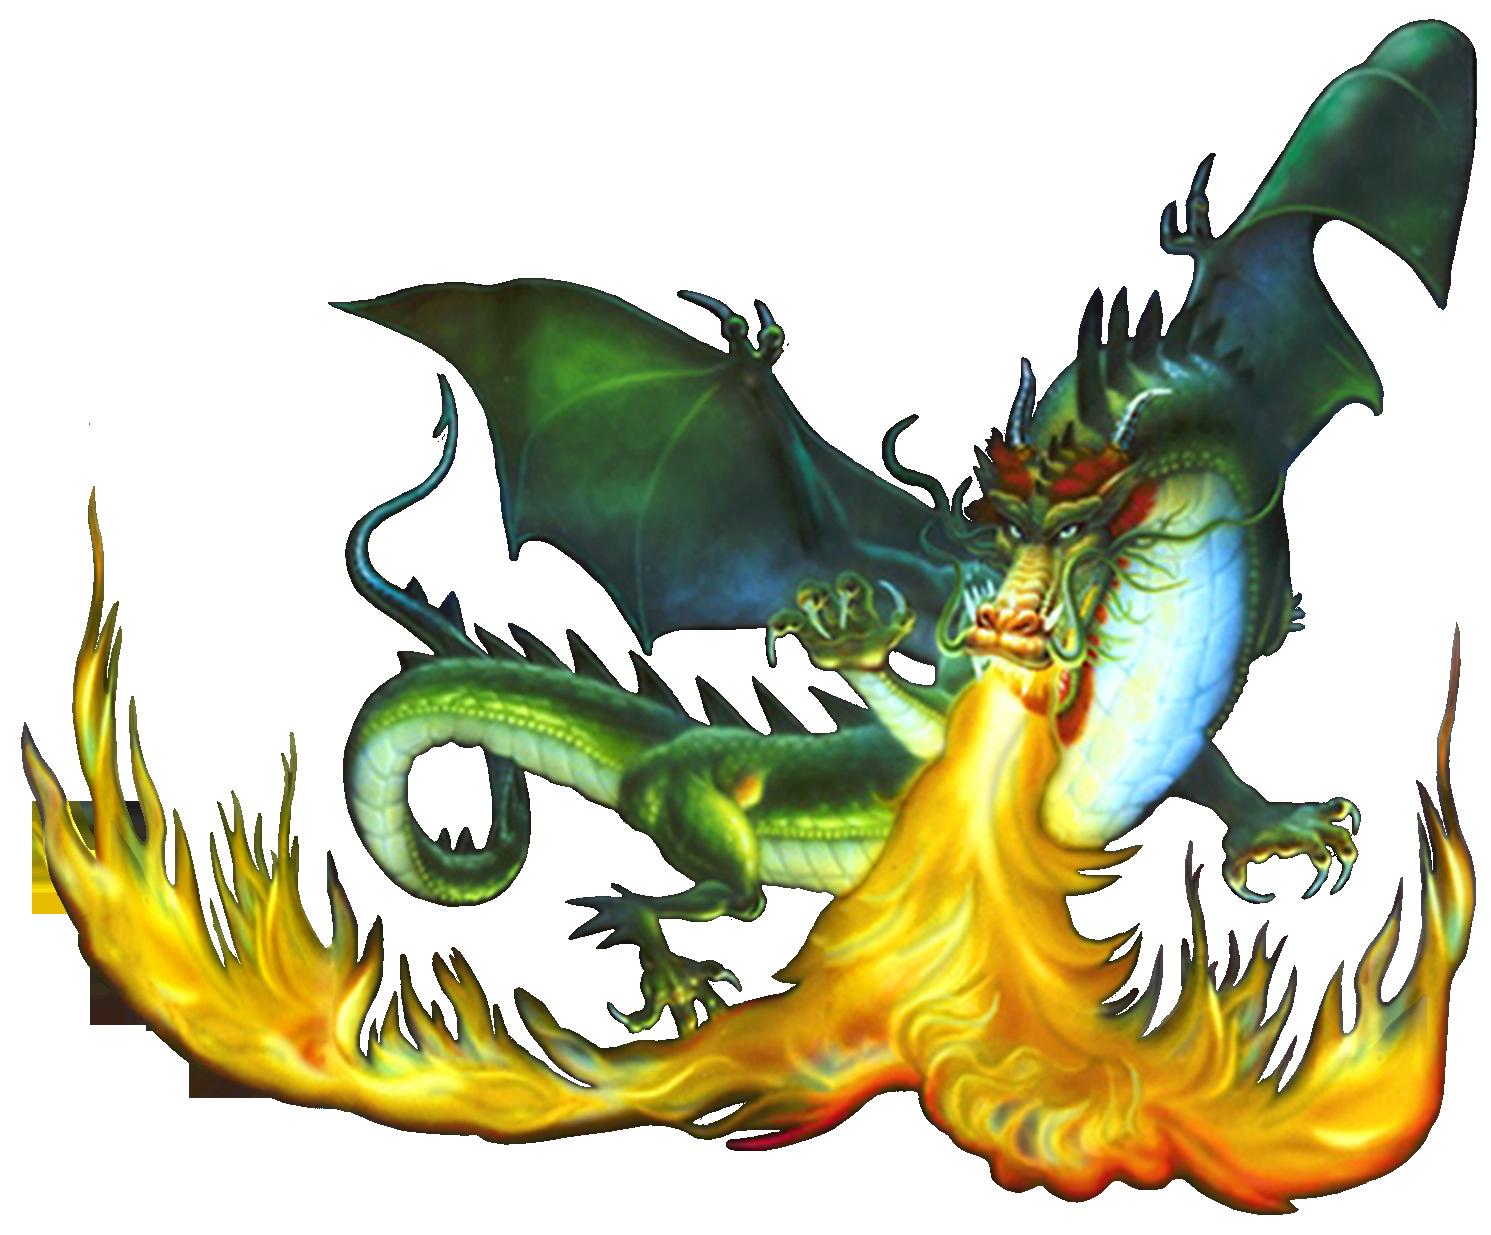 Dragon clipart drogon. Fire breathing by sandara